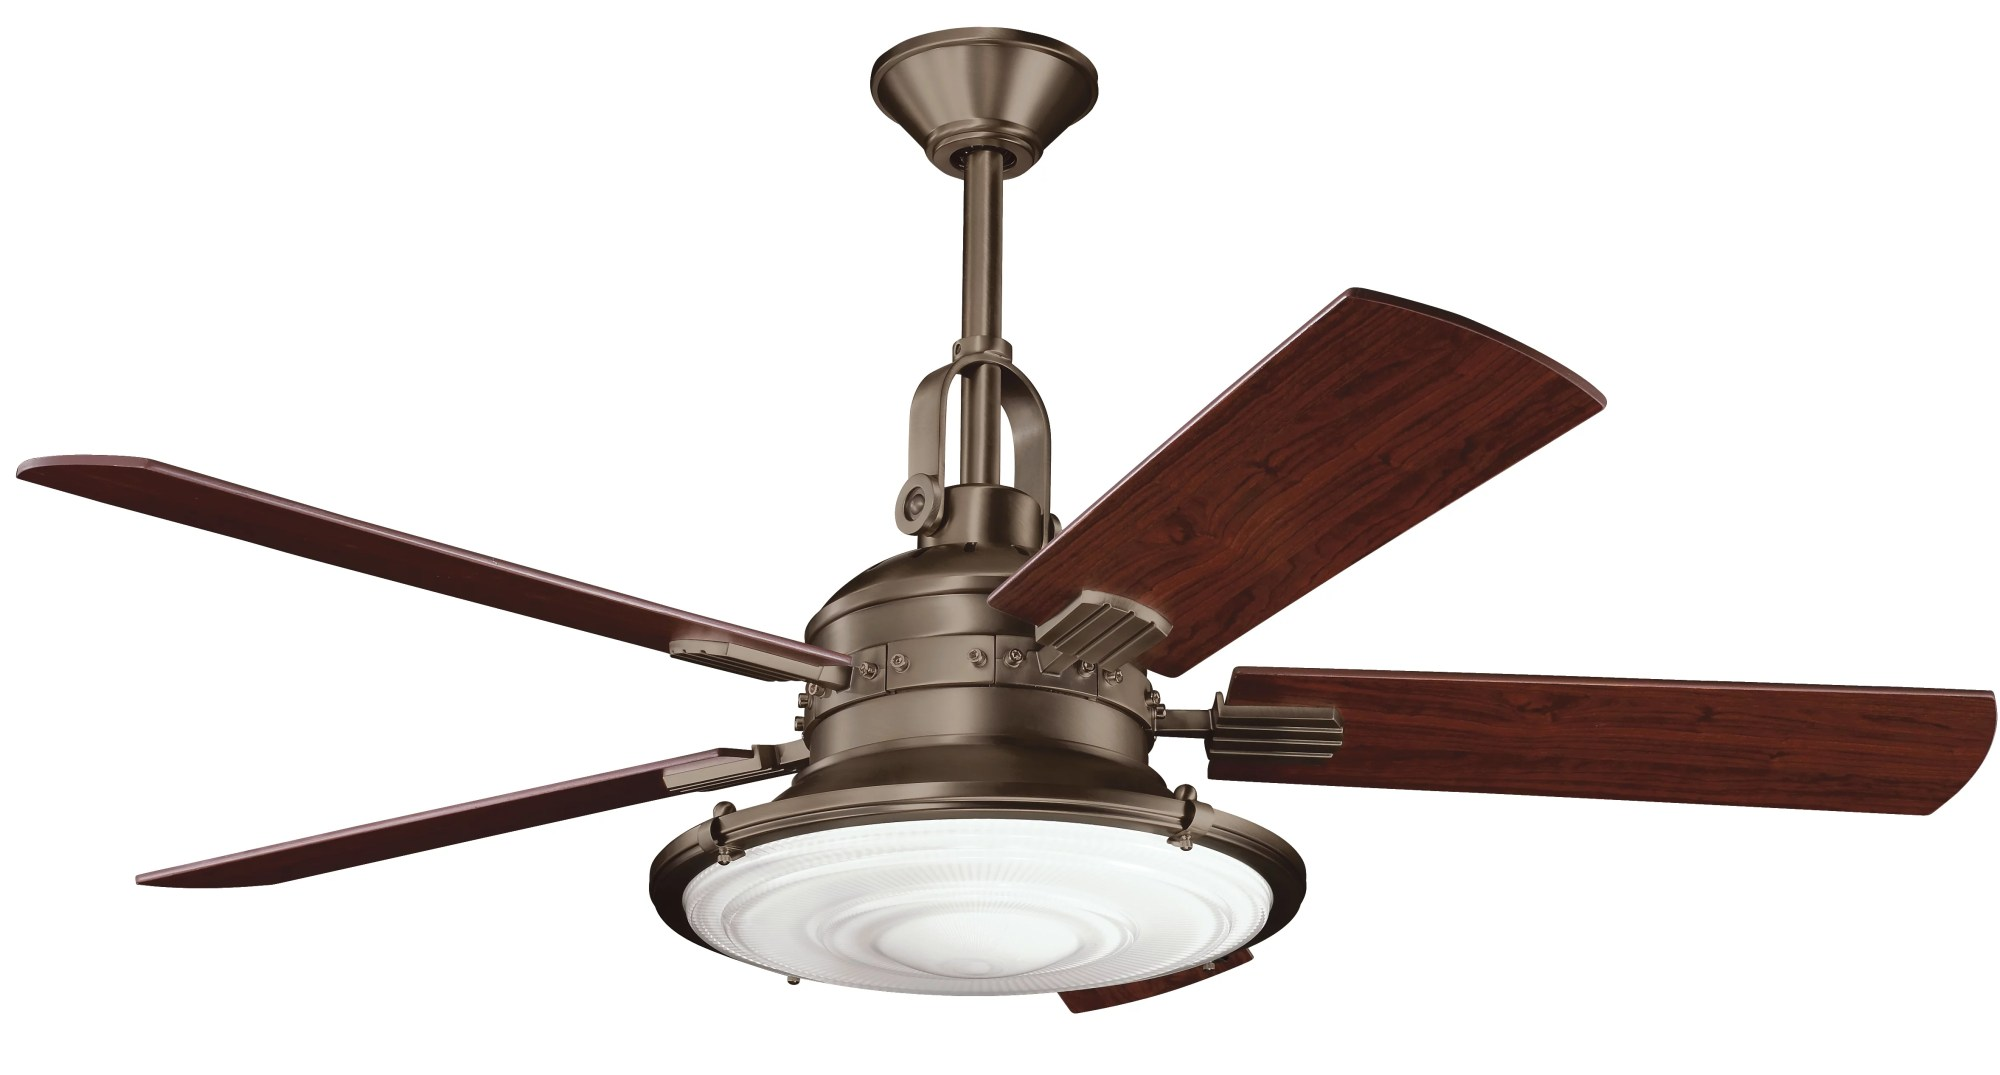 hight resolution of kichler 300020ap kittery point 52 ceiling fan